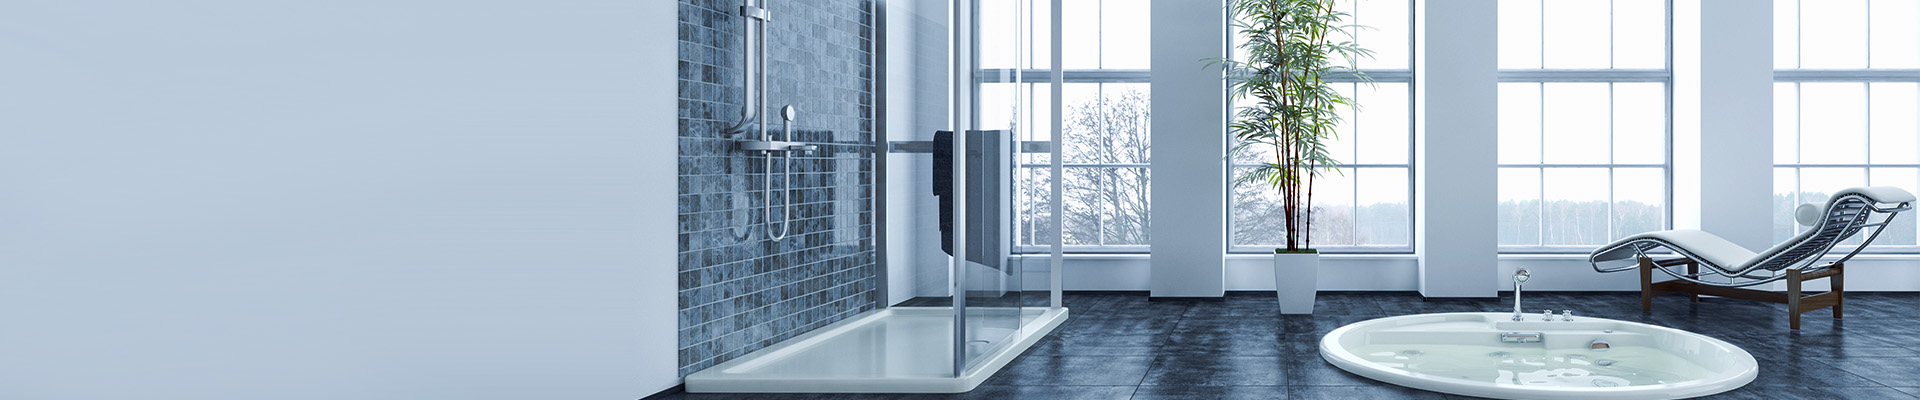 Duschkabinen in München